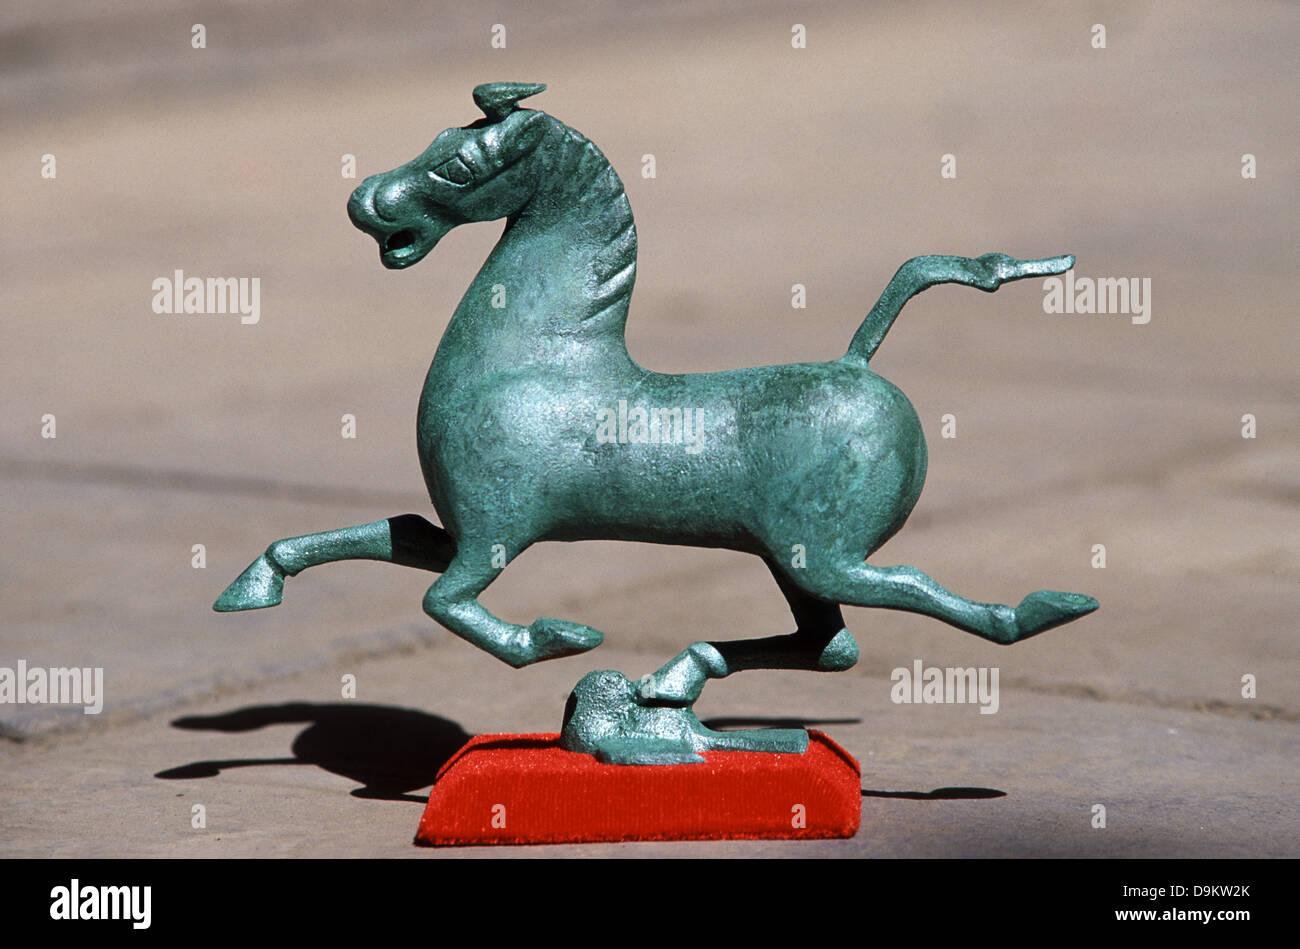 a miniature model sold as souvenir depicting the gansu flying